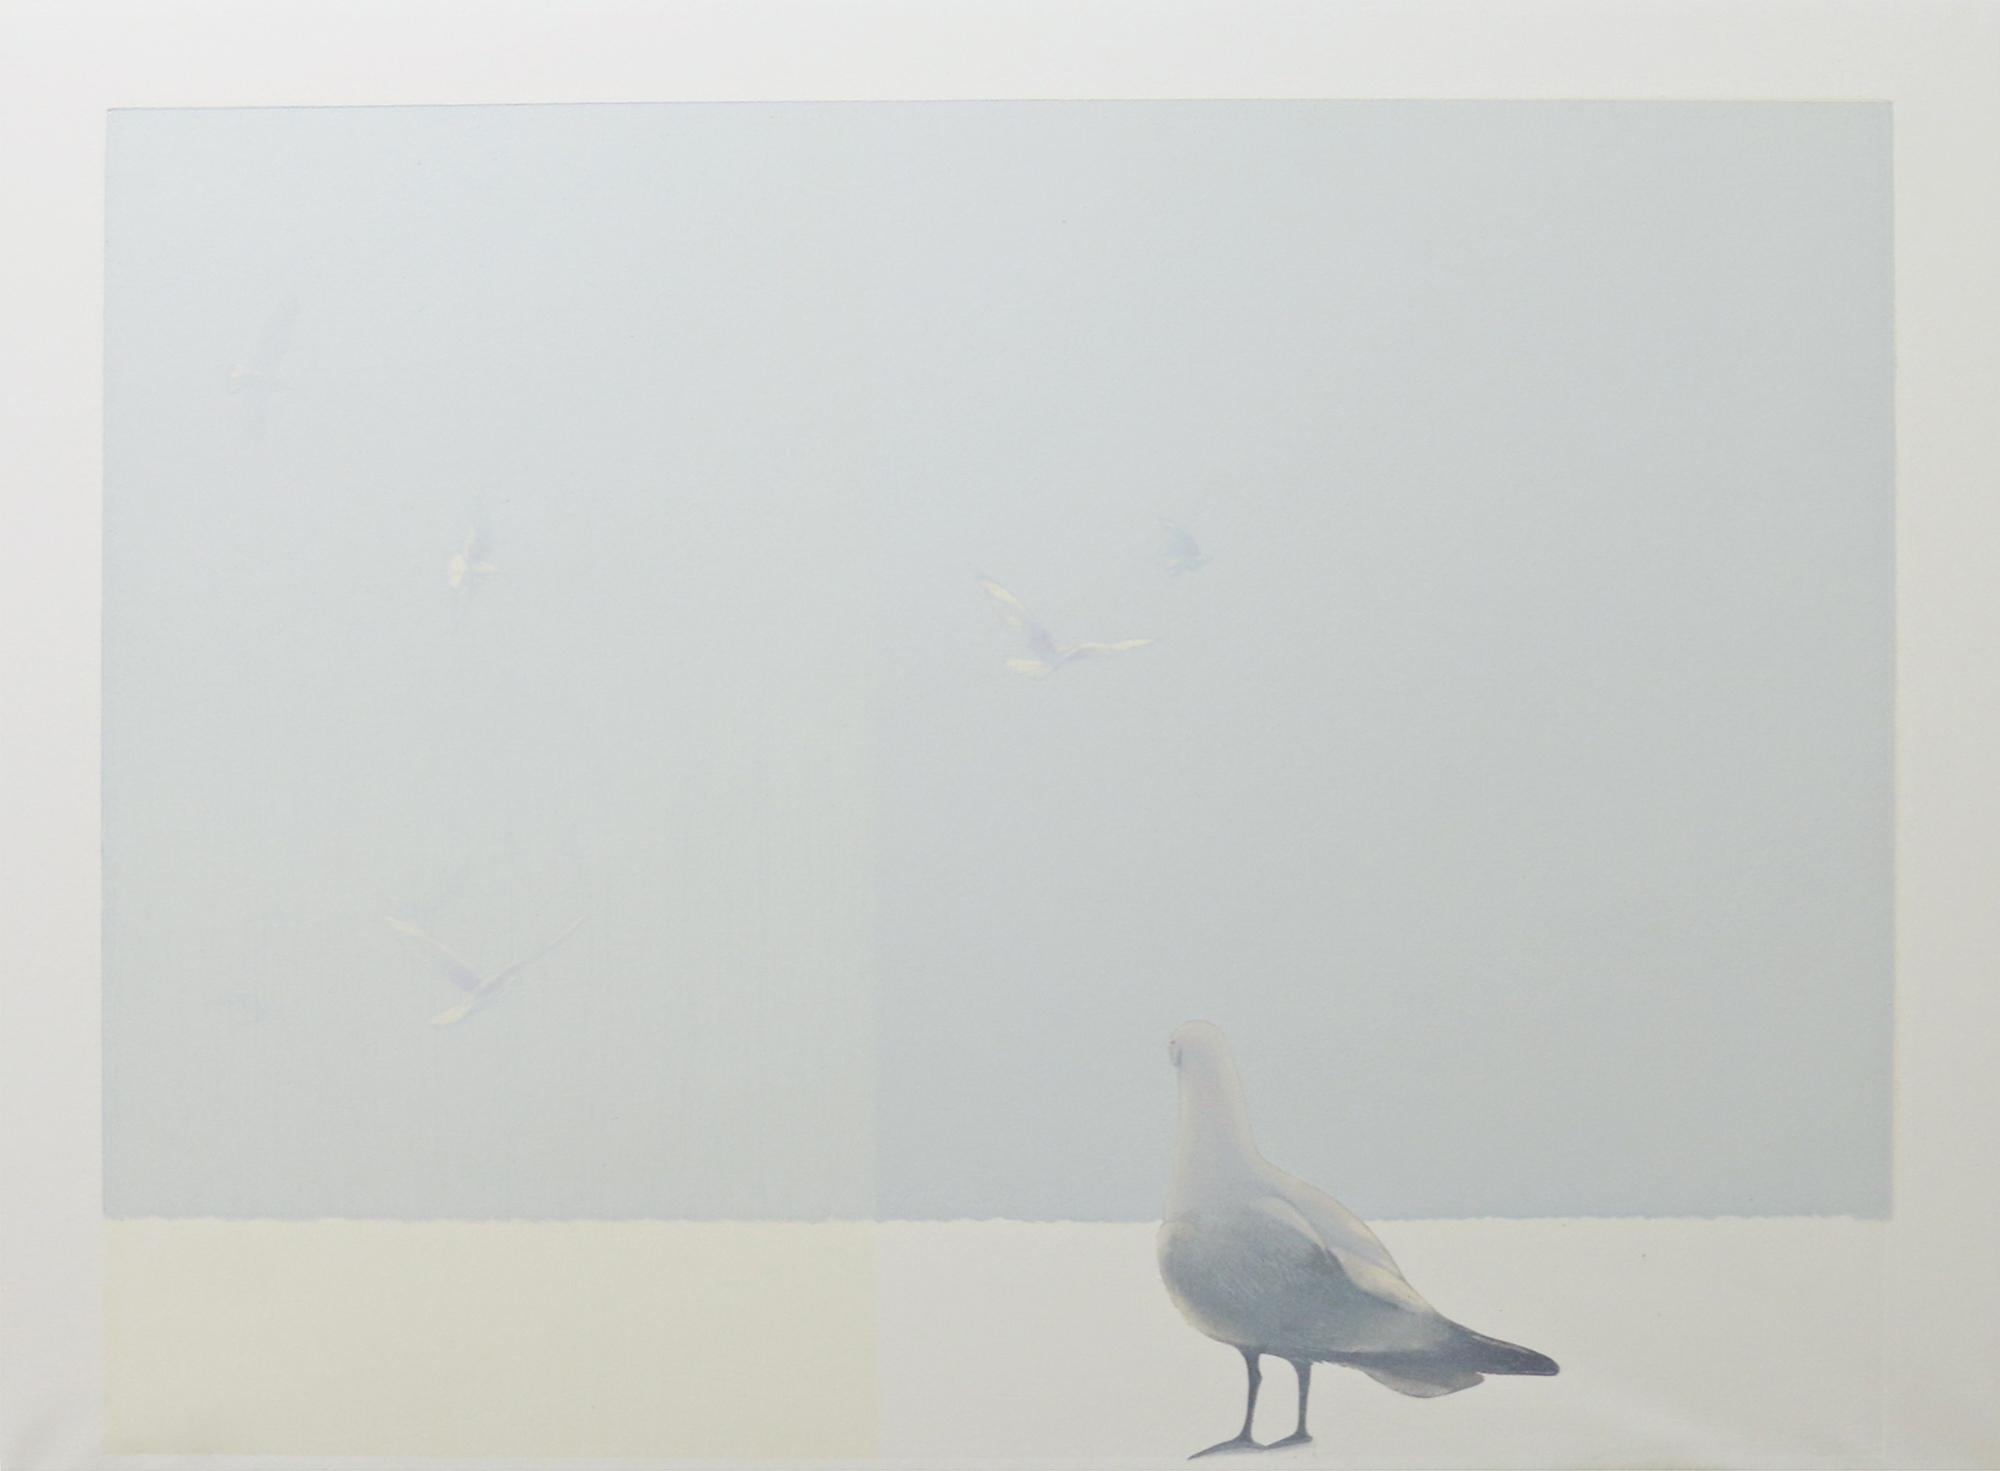 PIANGCHOOMPU Praween, Middle Of Nowhere #2, 2018, Woodcut Print on Paper, 60 x 80 cm, Affinity Art.jpg